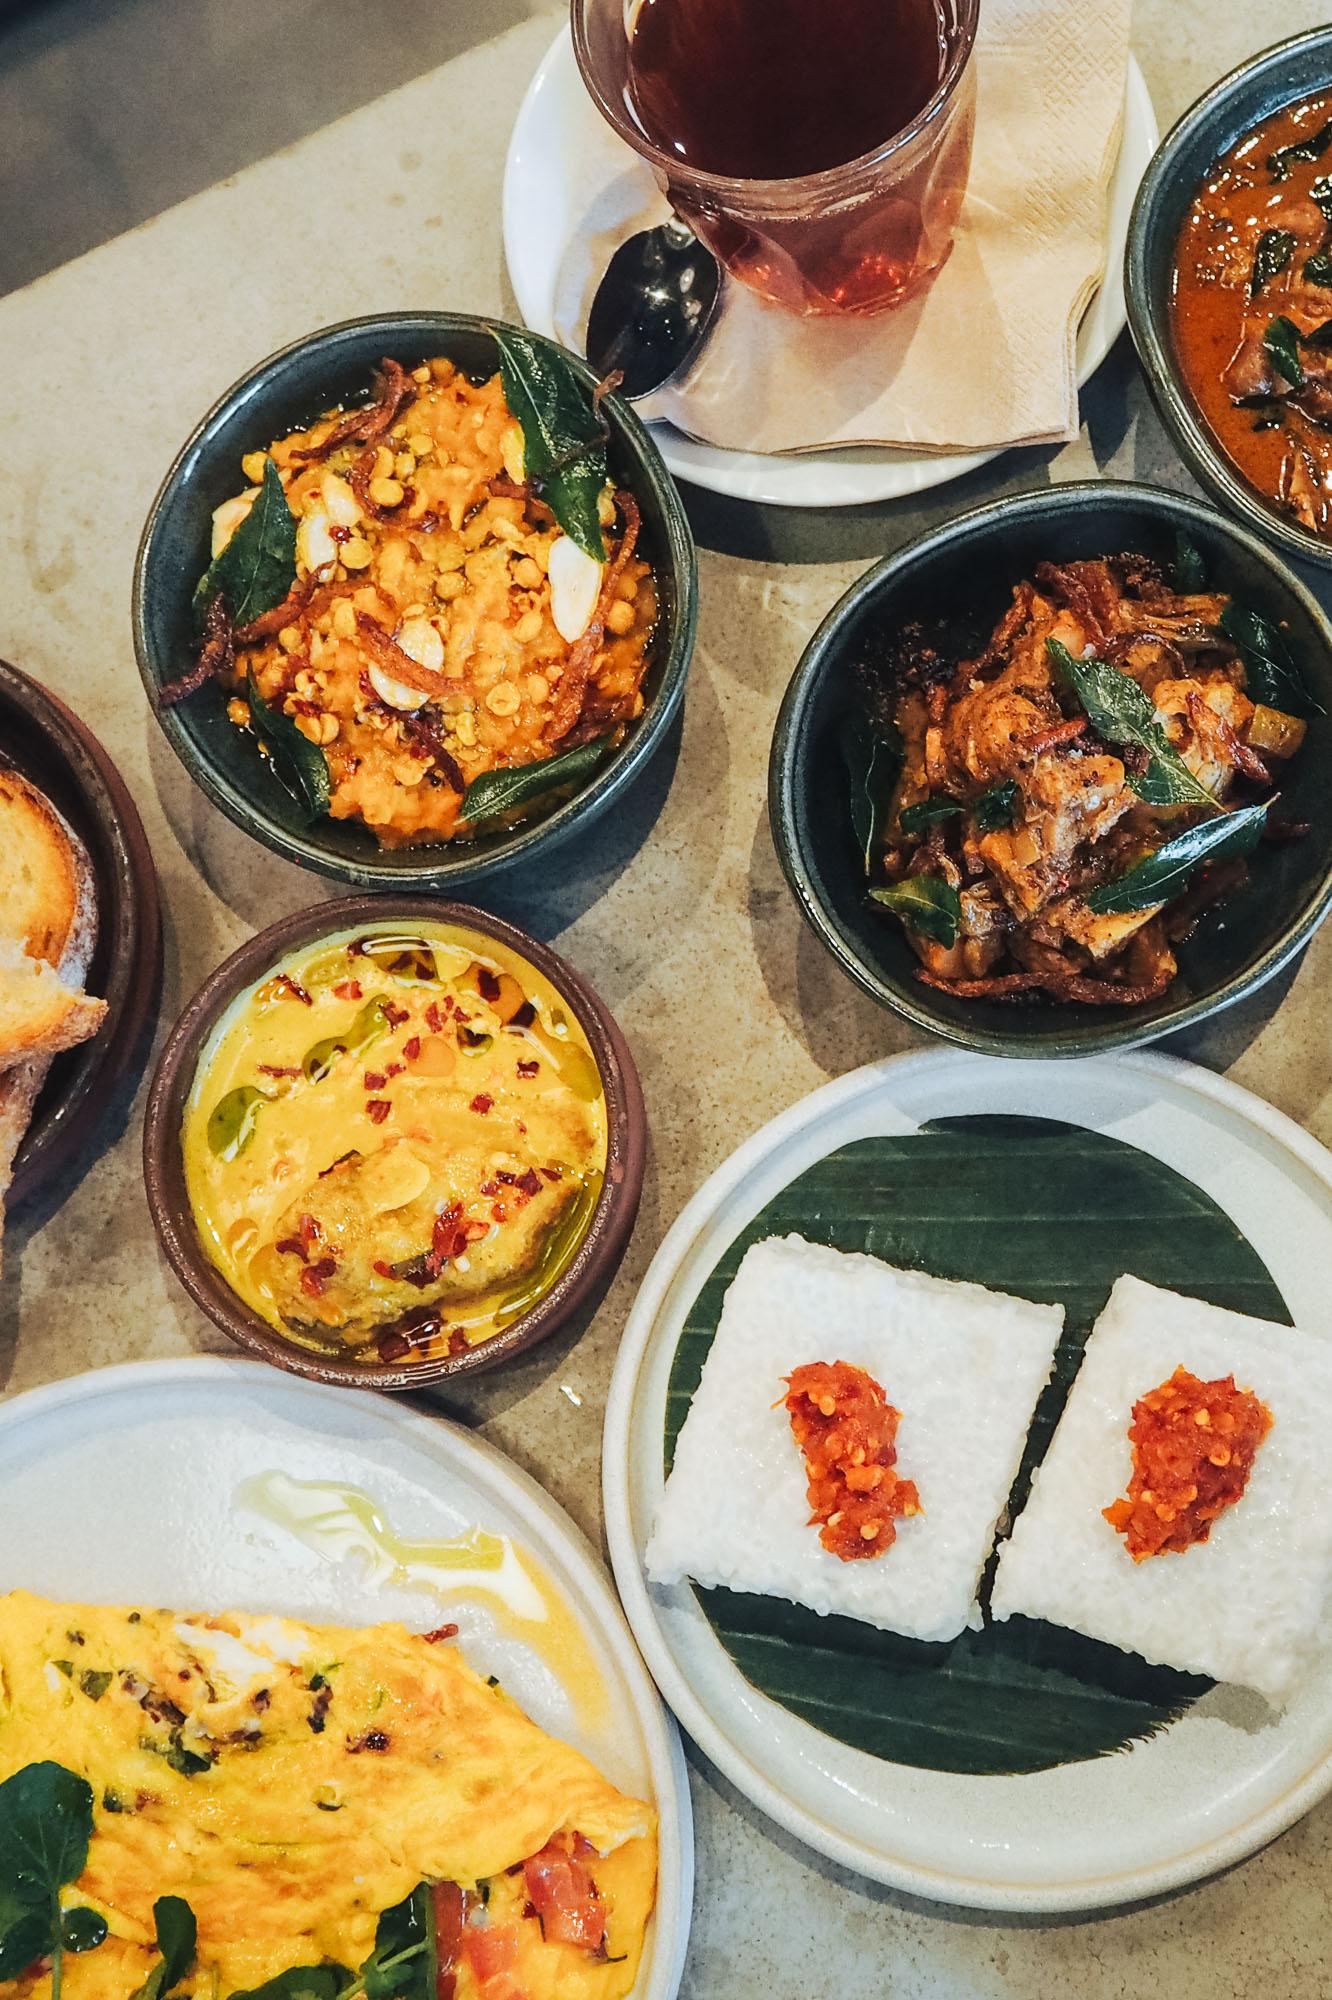 Weekend brunch menu at Kolamba in Soho, London inspired by Sri Lankan food staples and British food classics